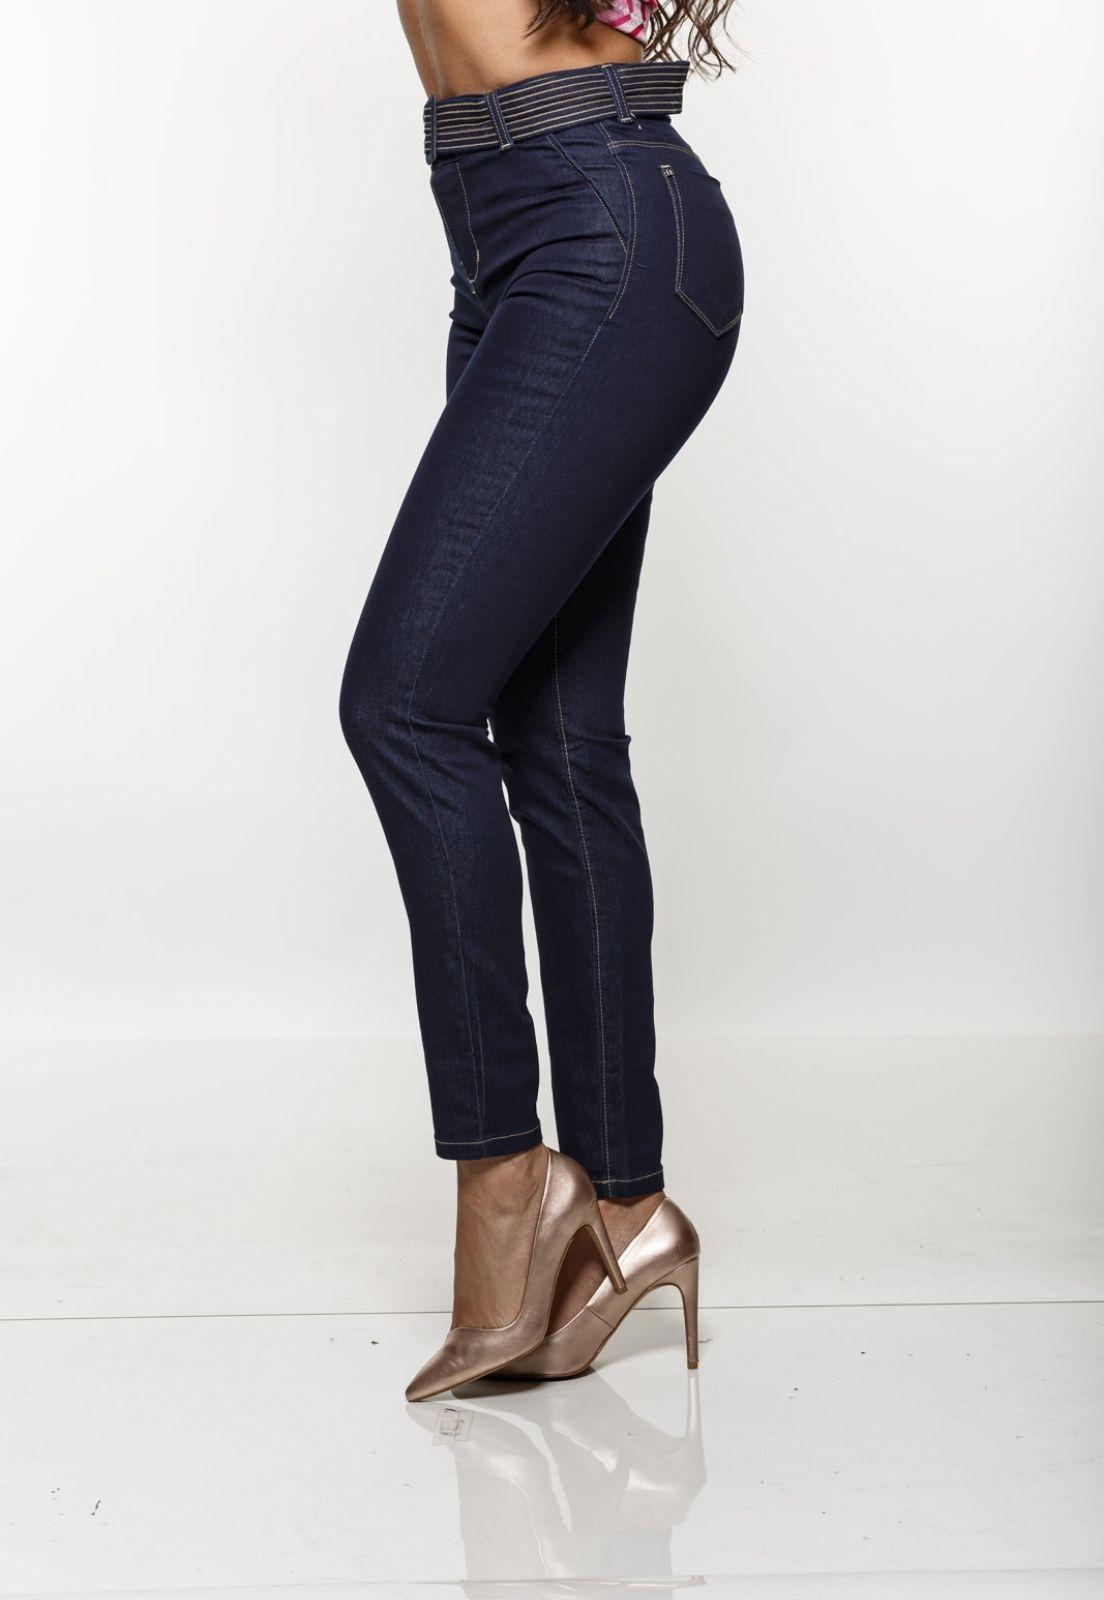 Calça Jeans Feminina Skinny Crocker - 48106  - CROCKER JEANS